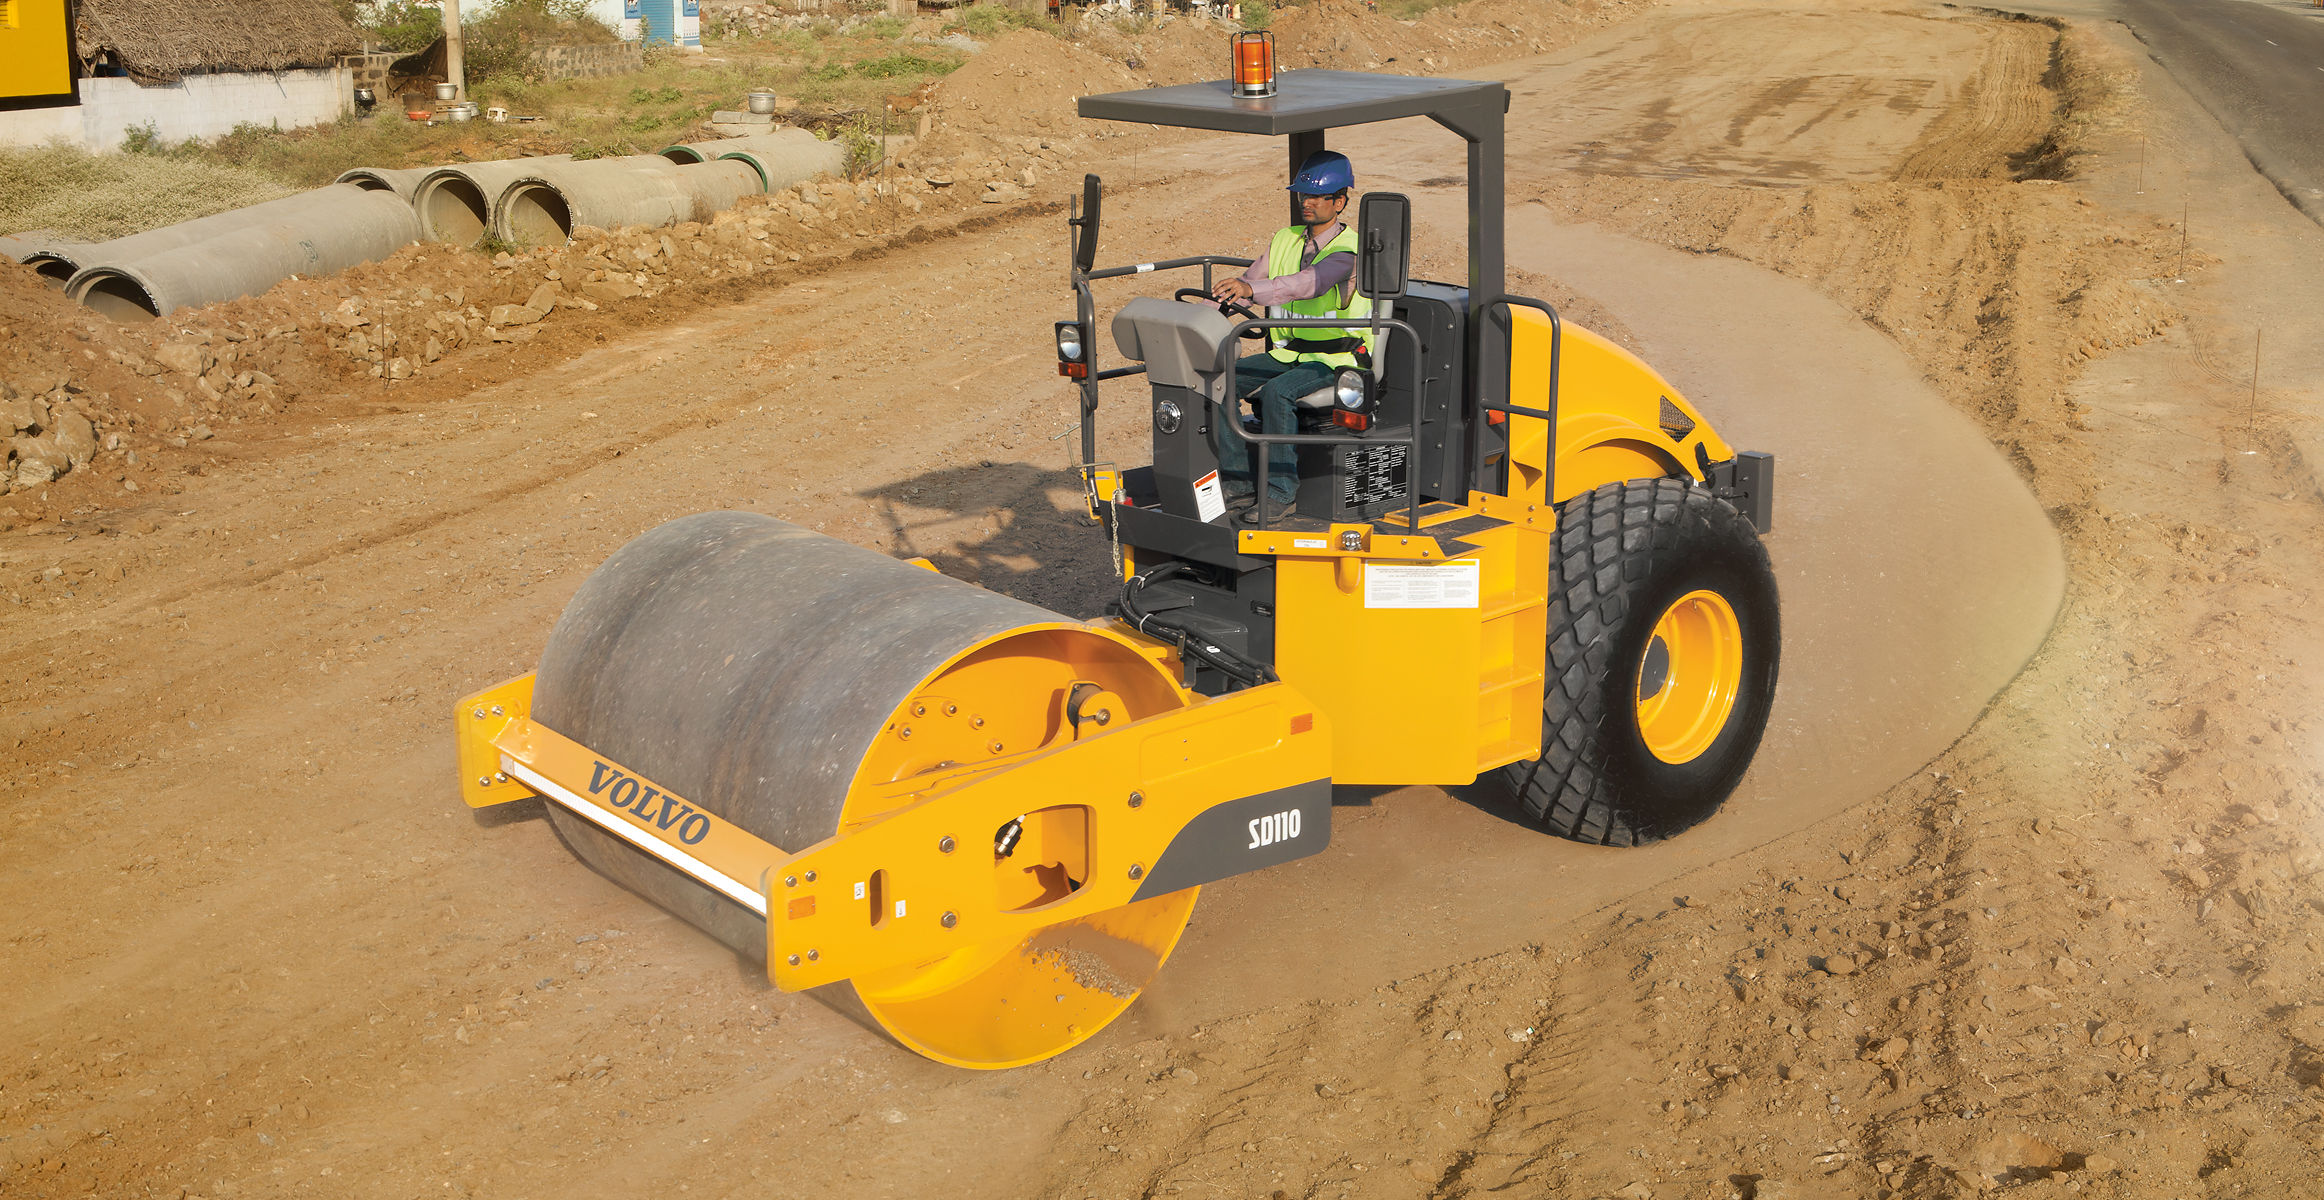 sd110 soil compactors overview volvo construction equipment